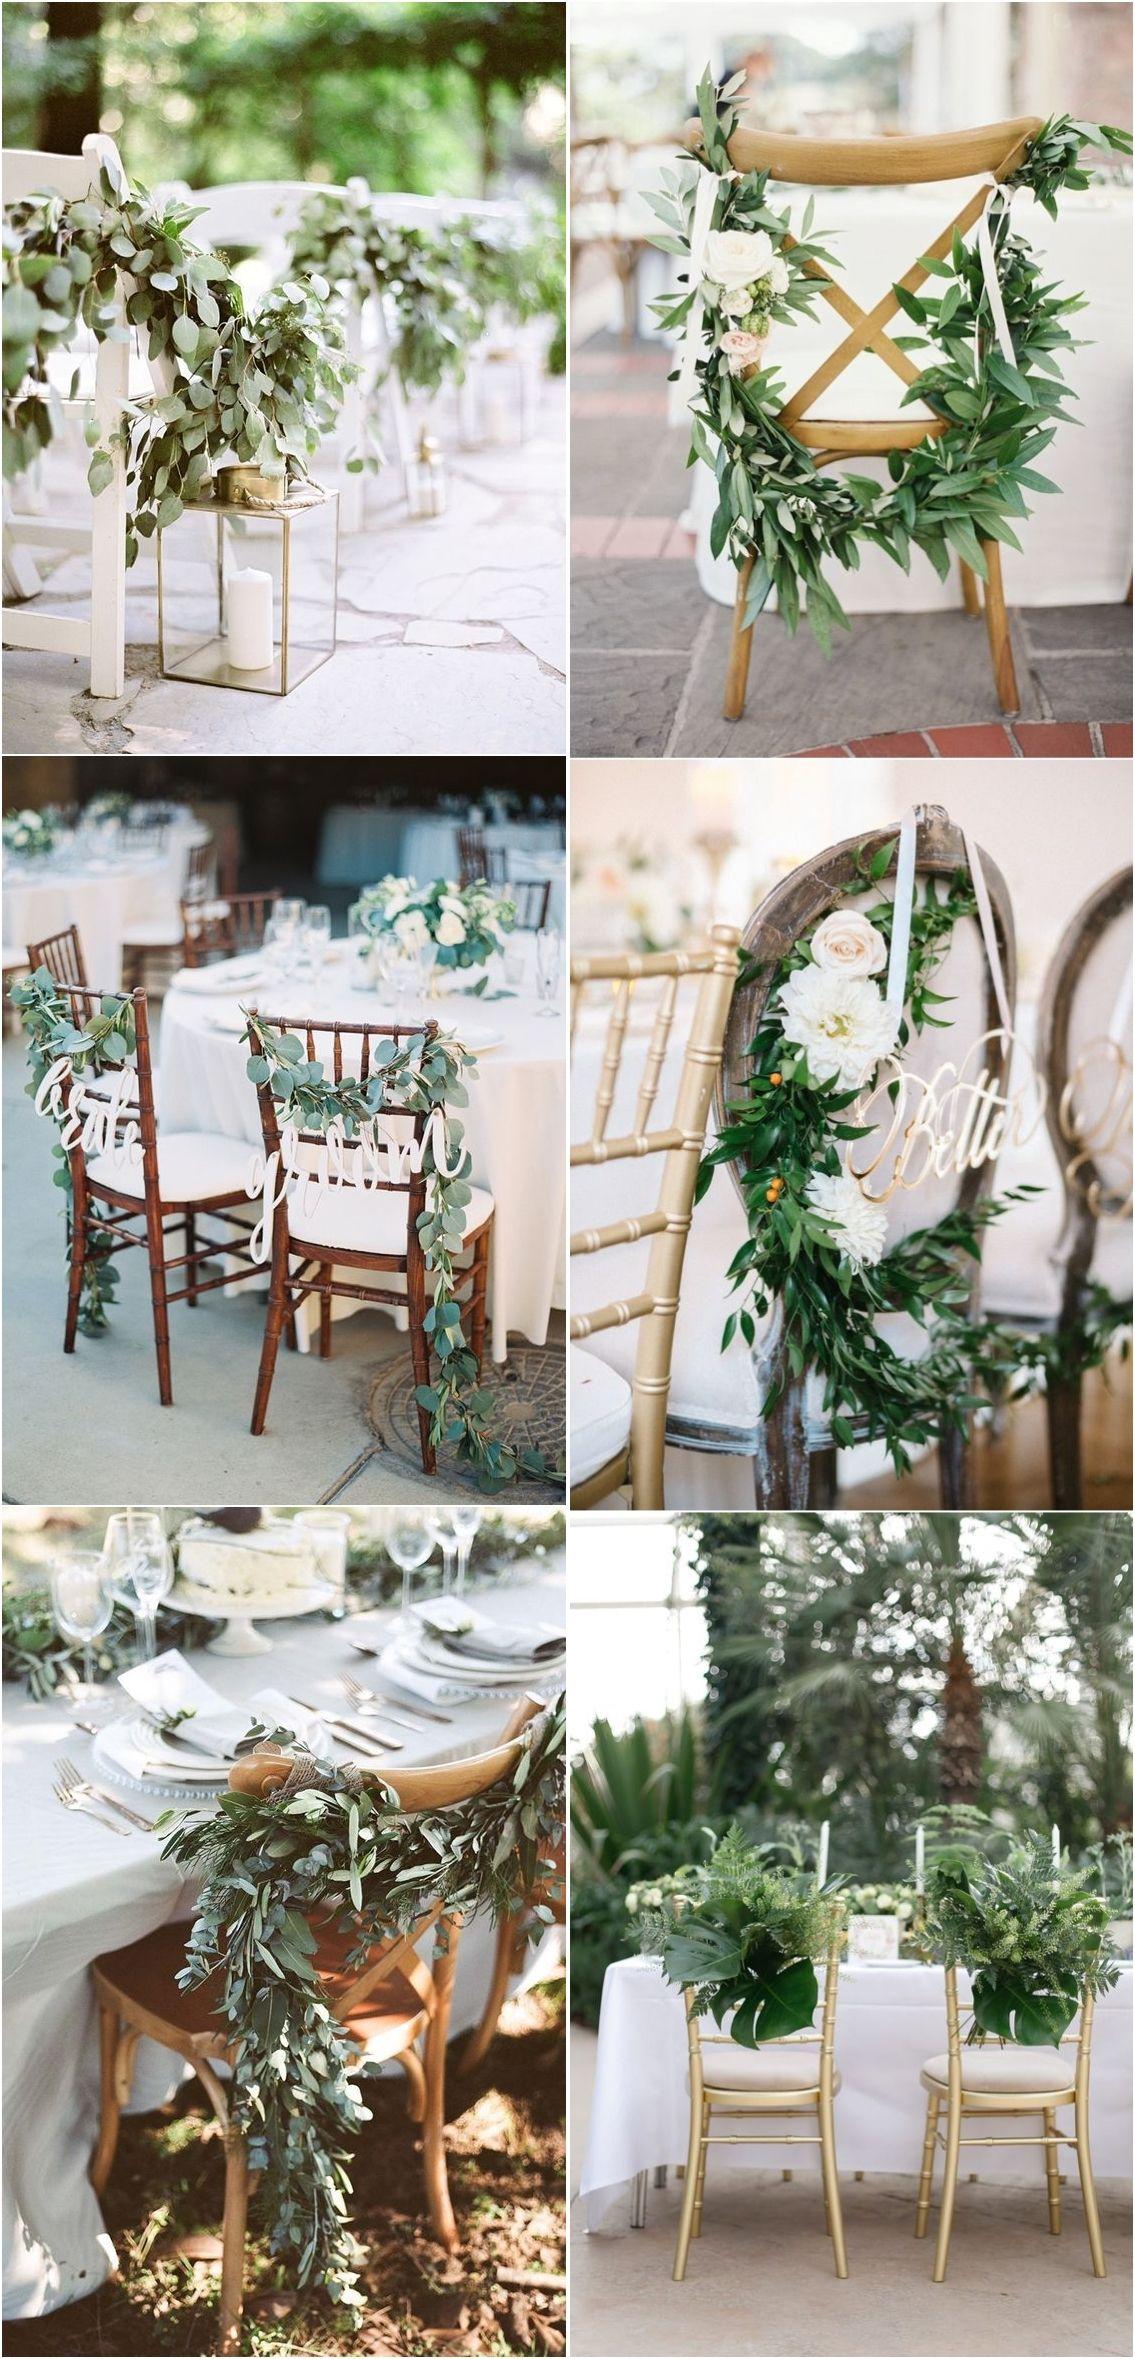 Decor ideas for wedding   Wedding Trends  Greenery Wedding Decor Ideas  Wedding